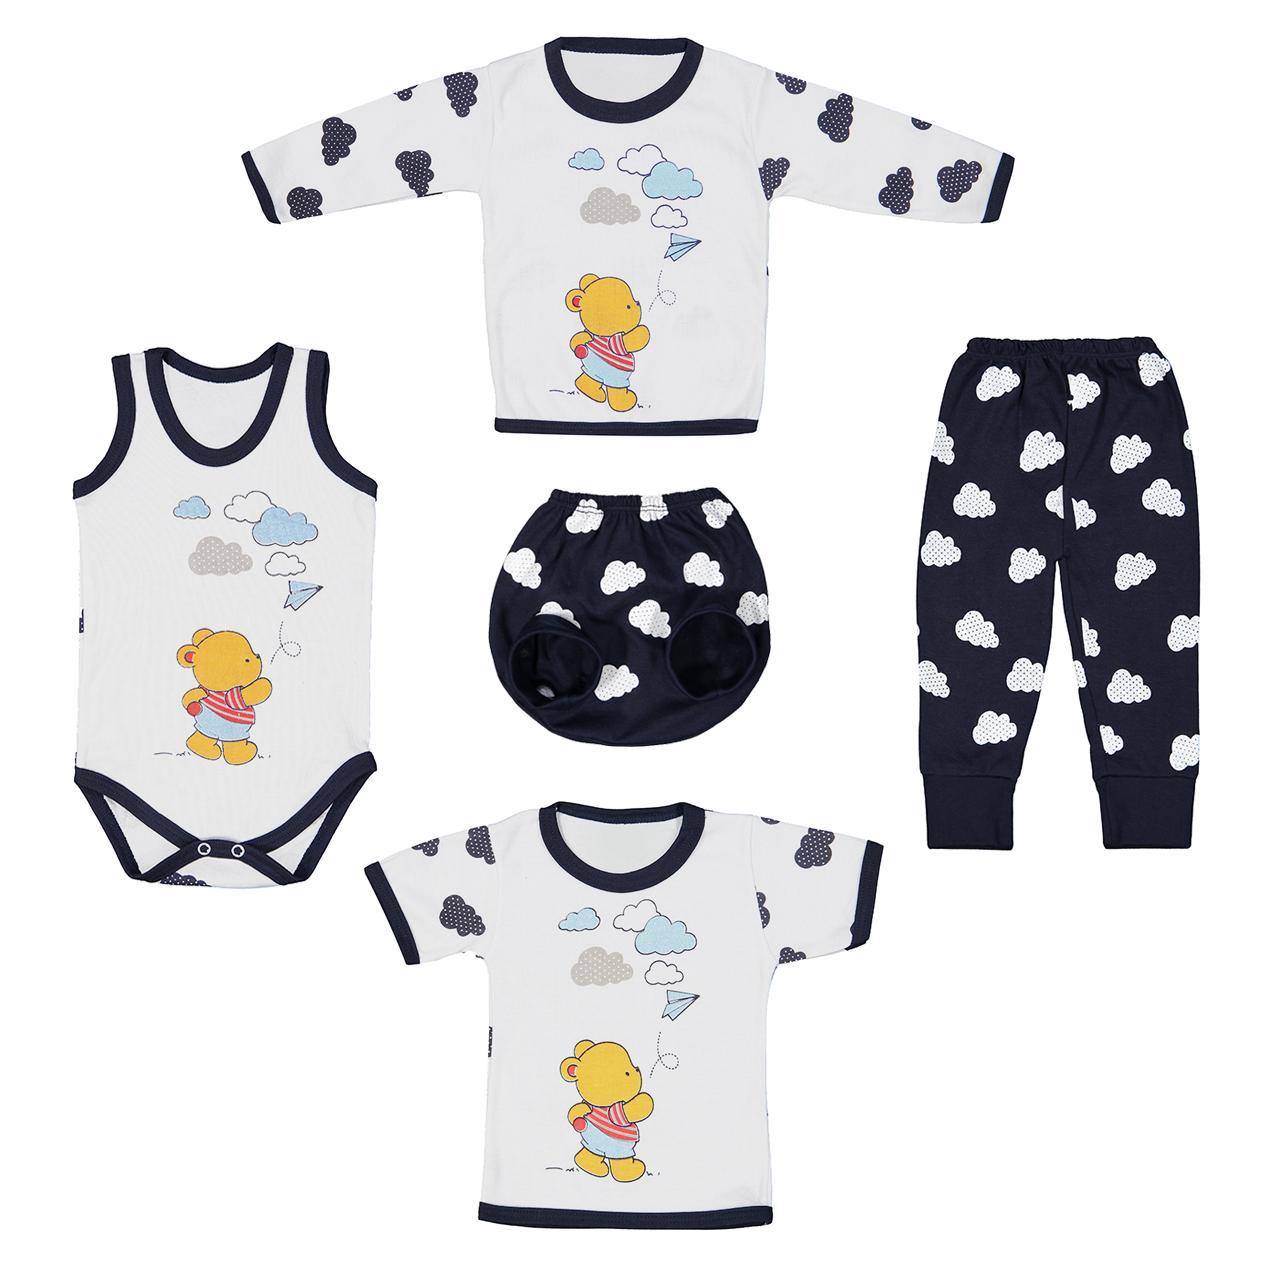 ست 5 تکه لباس نوزادی طرح خرس ابری کد M27